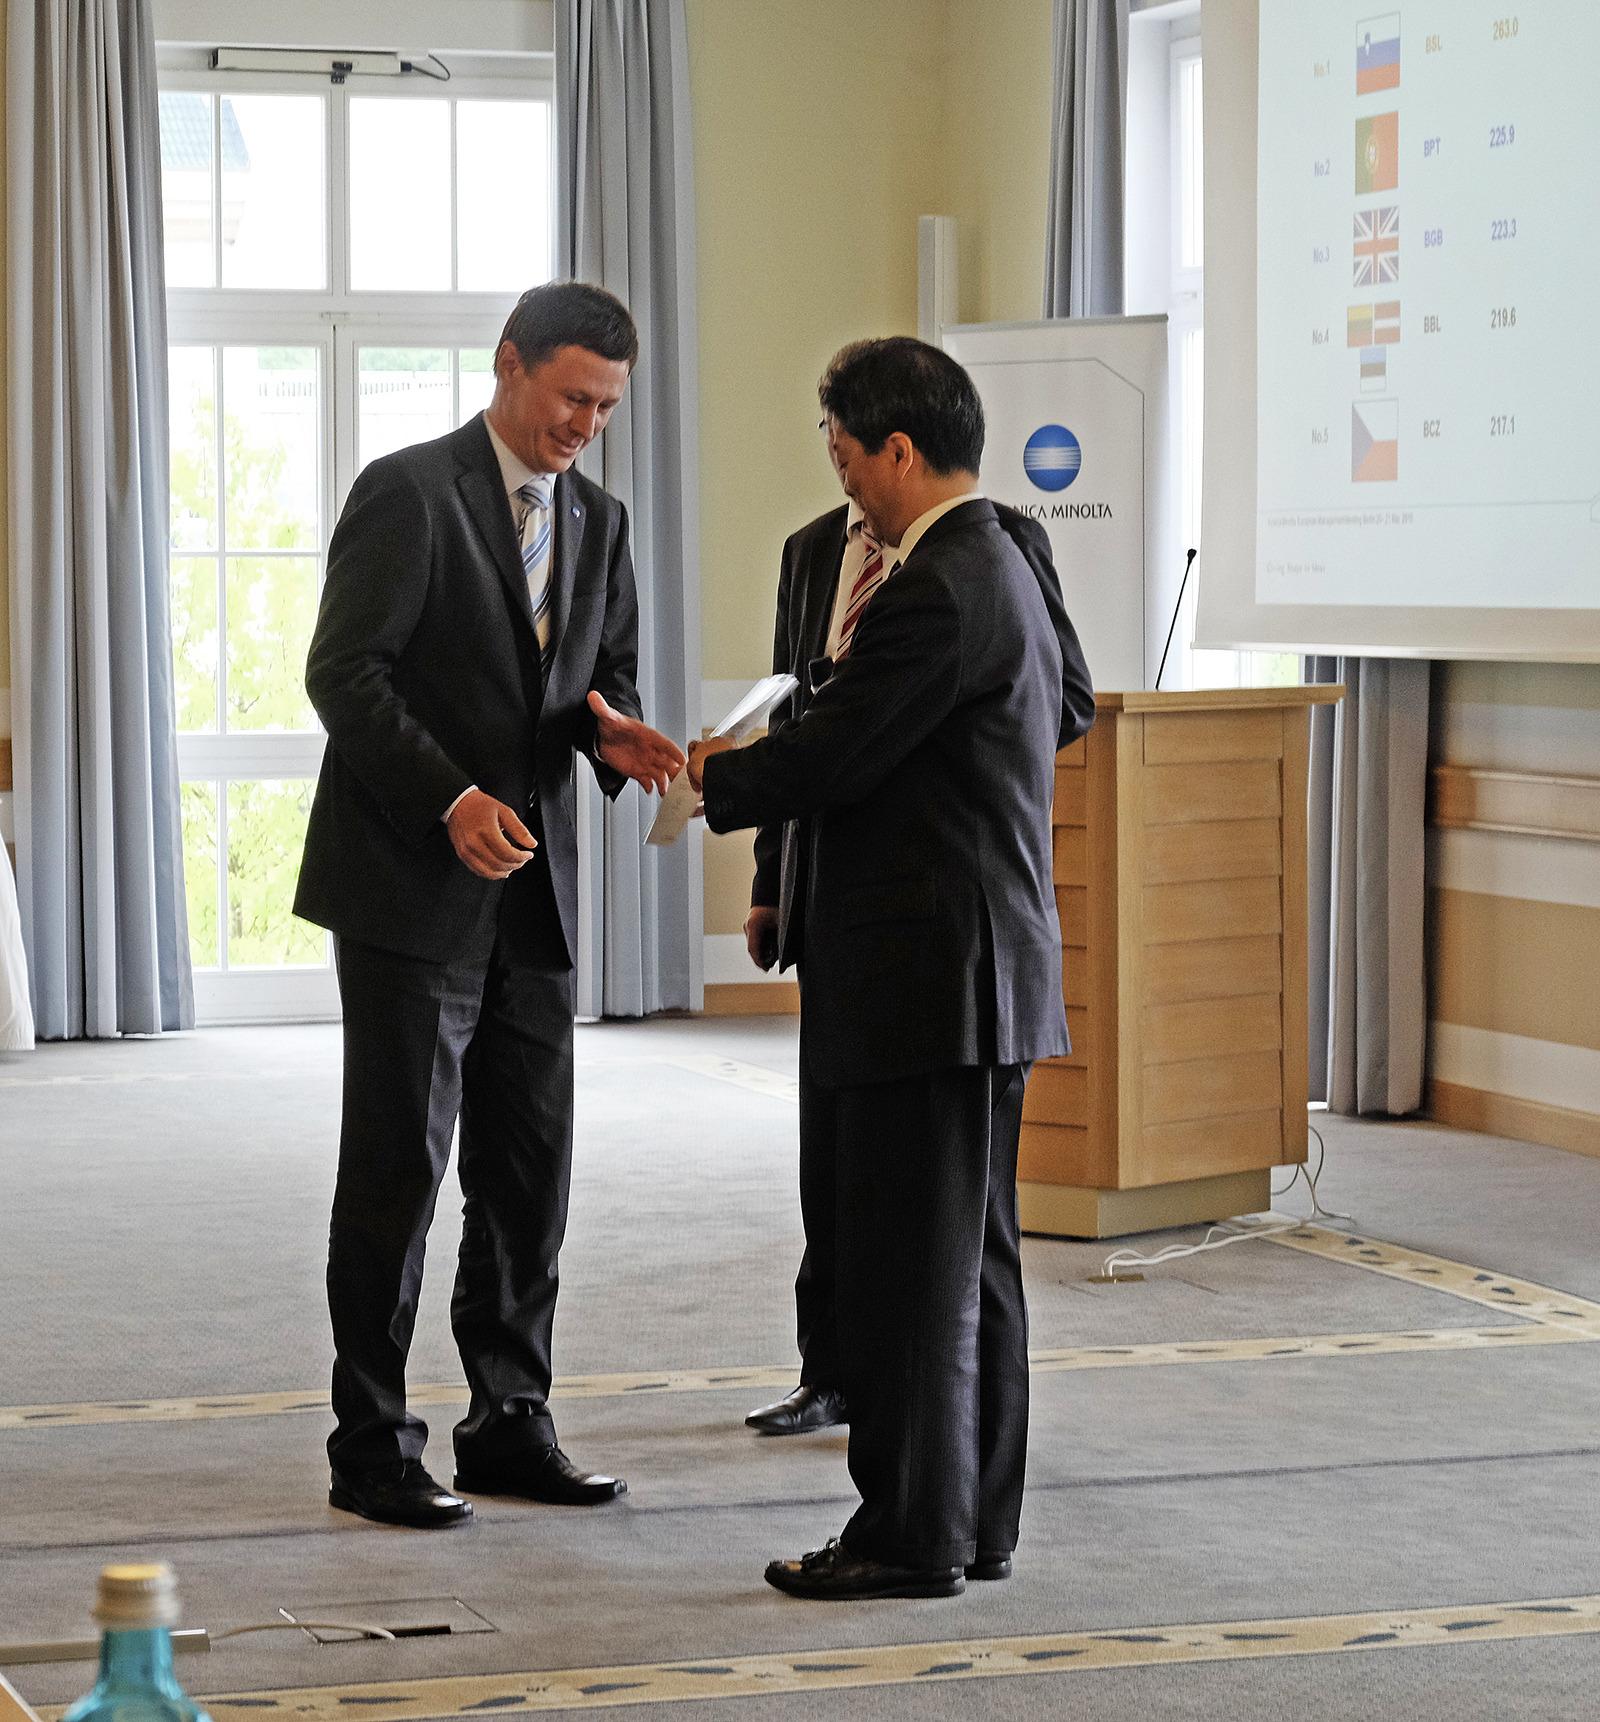 Podelitev nagrade v Berlinu. Na sliki, levo Pavel Čurda, direktor Konica Minolta Slovenija, desno Indy Nakagawa, predsednik uprave Konica Minolta Europe.